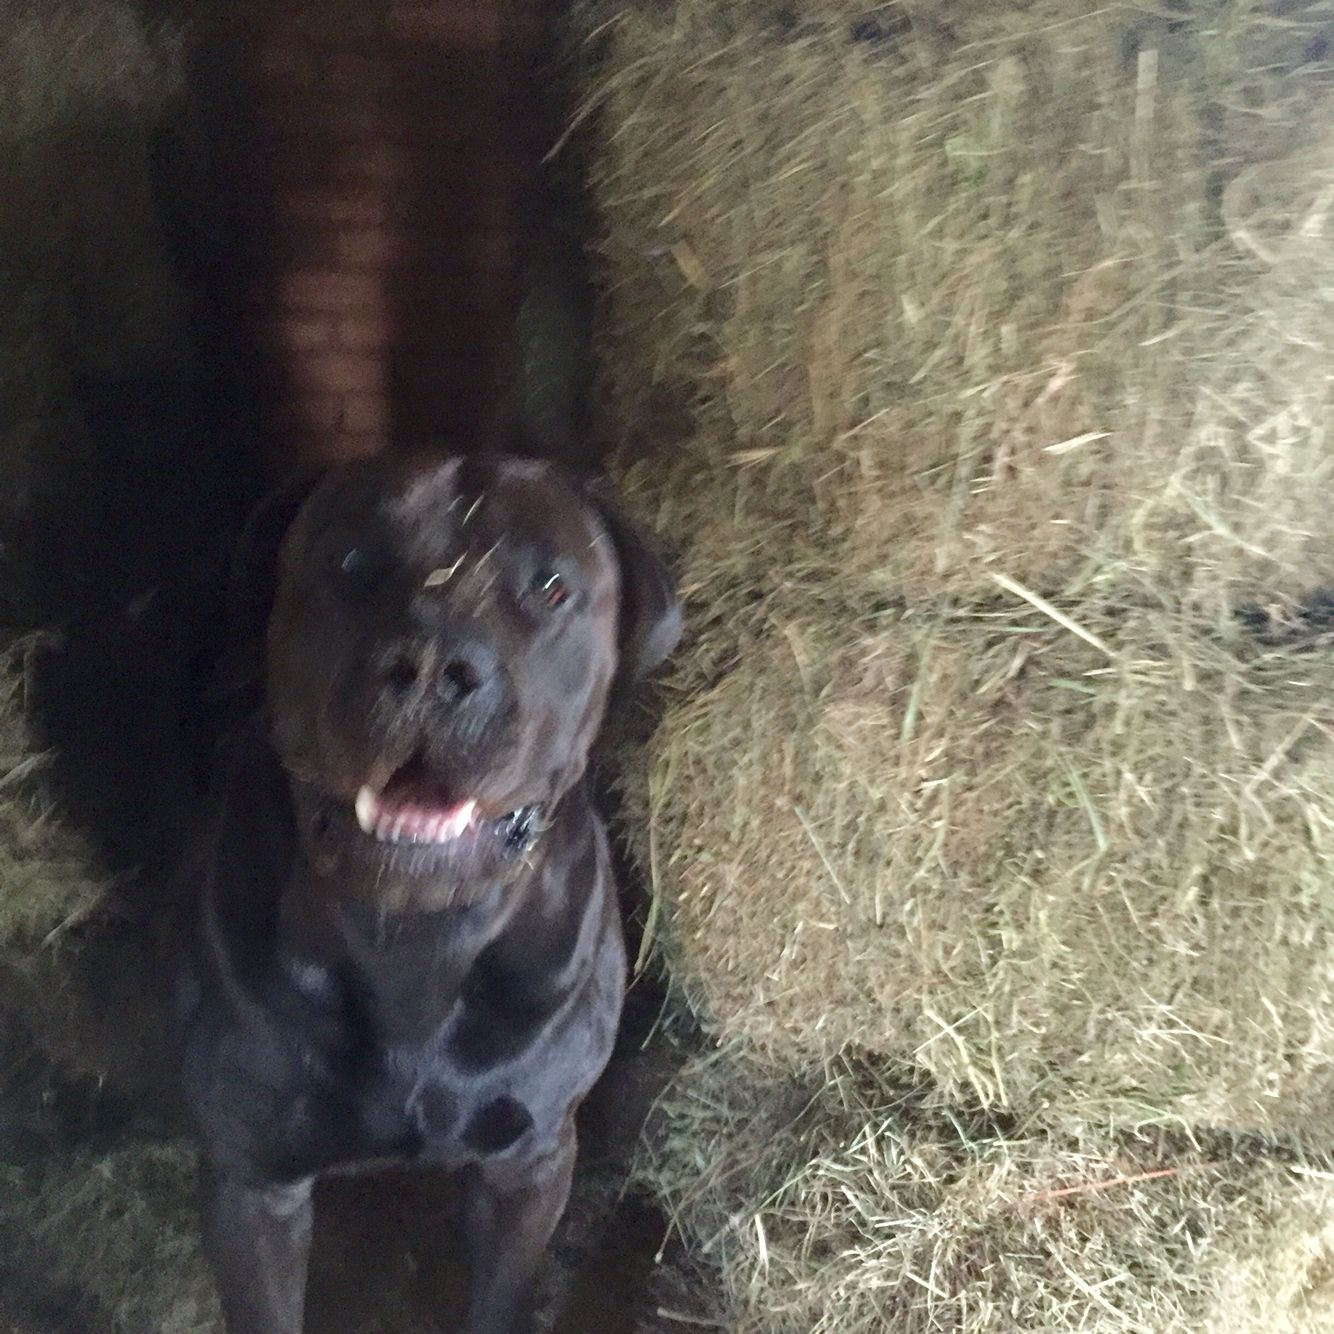 Amazing Boerboel Black Adorable Dog - 5e2a2db6ad9d8e30265684becc91a0fb  Pic_577751  .jpg